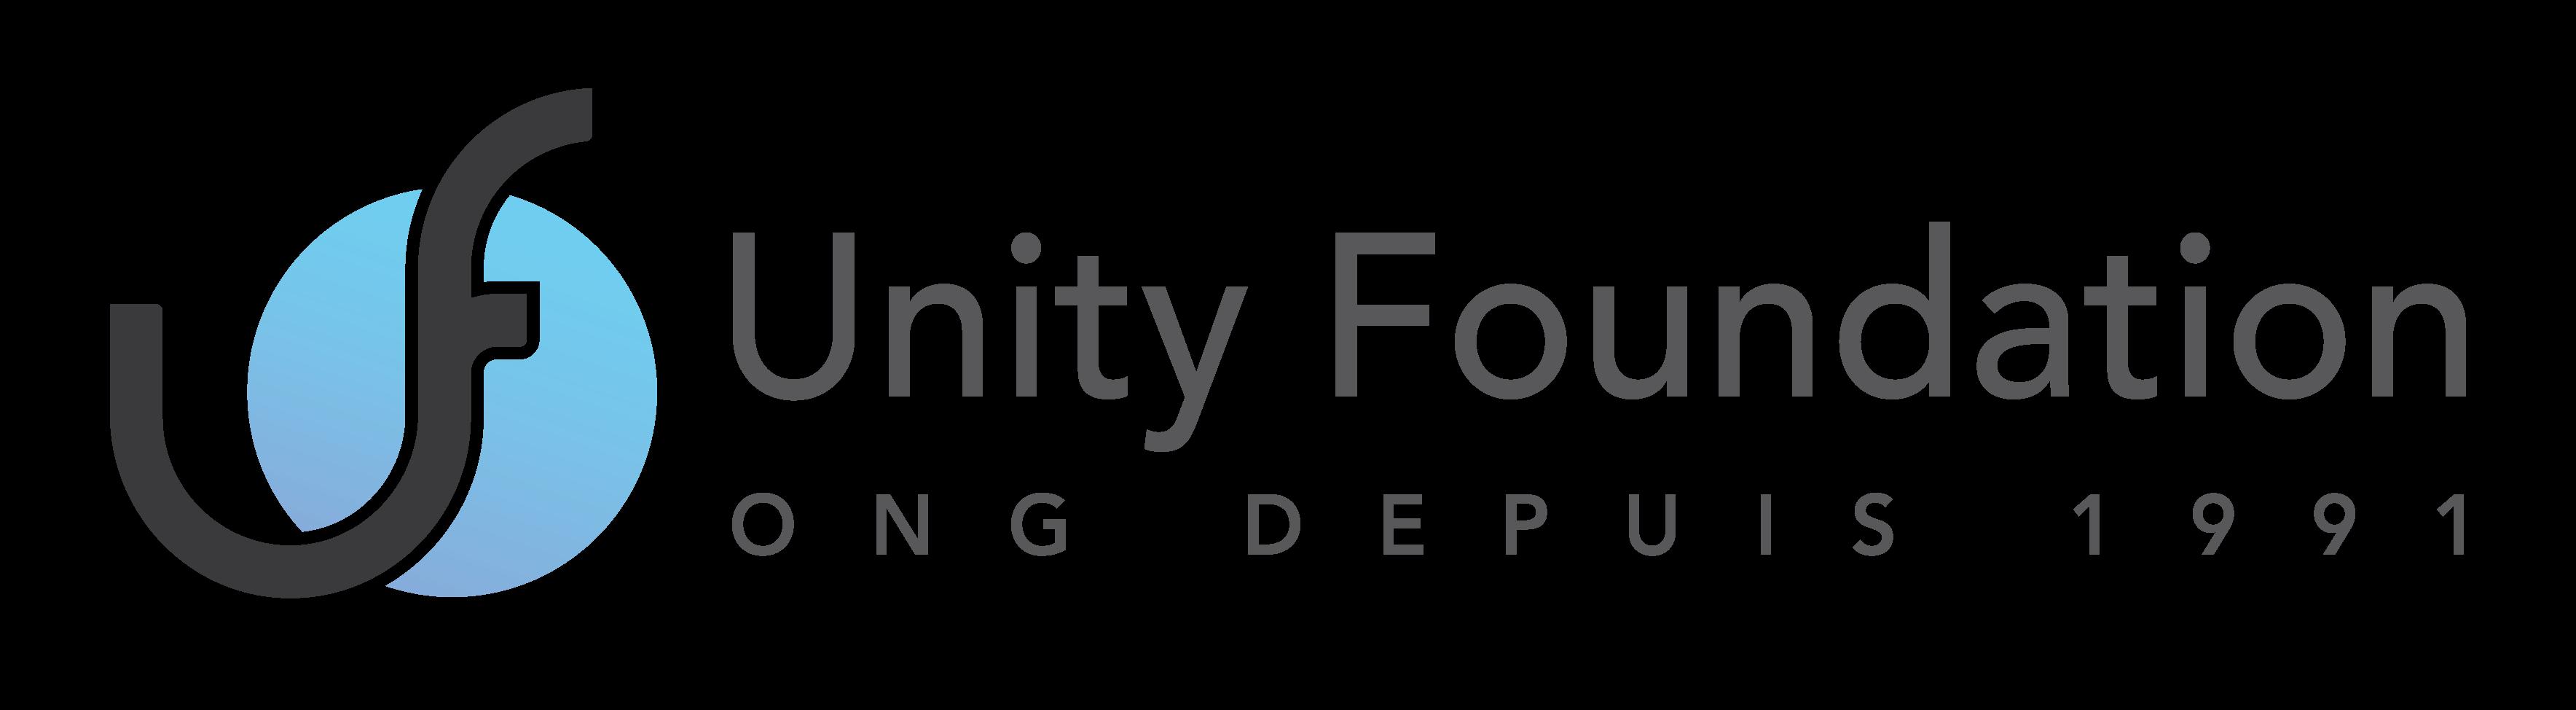 Unity Foundation – Empowering local communities through education